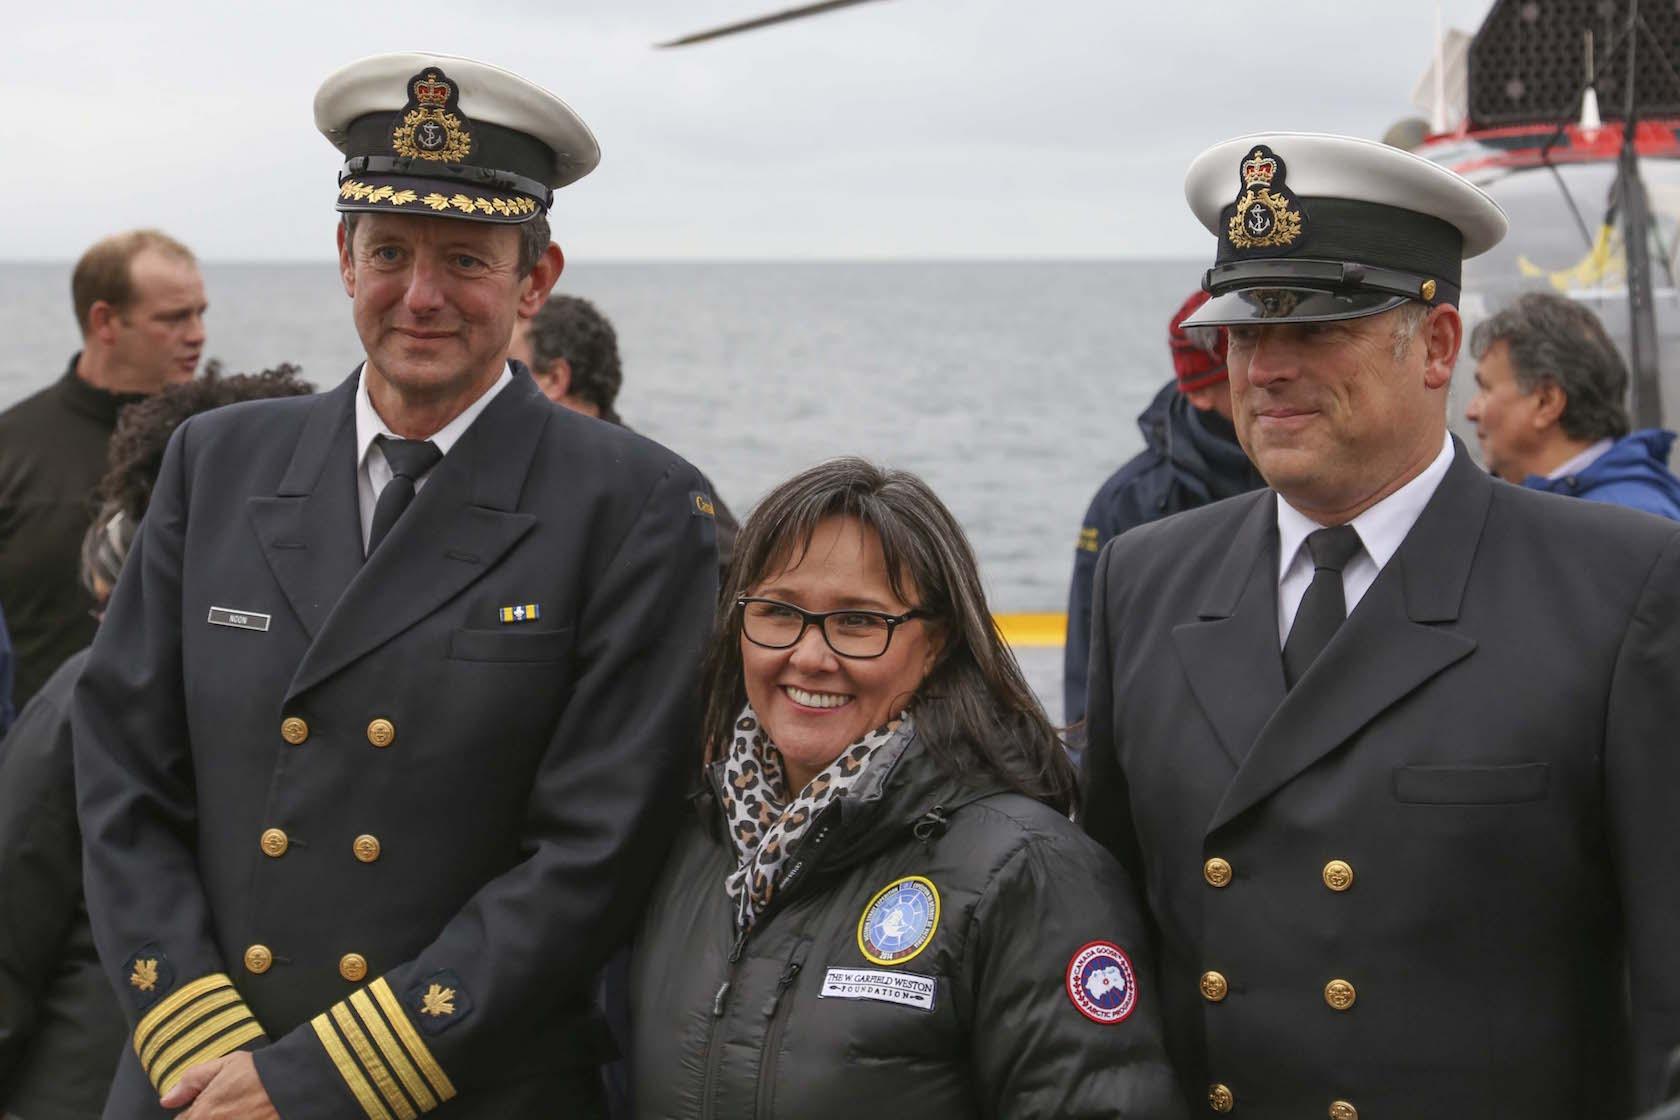 Victoria Strait Expedition